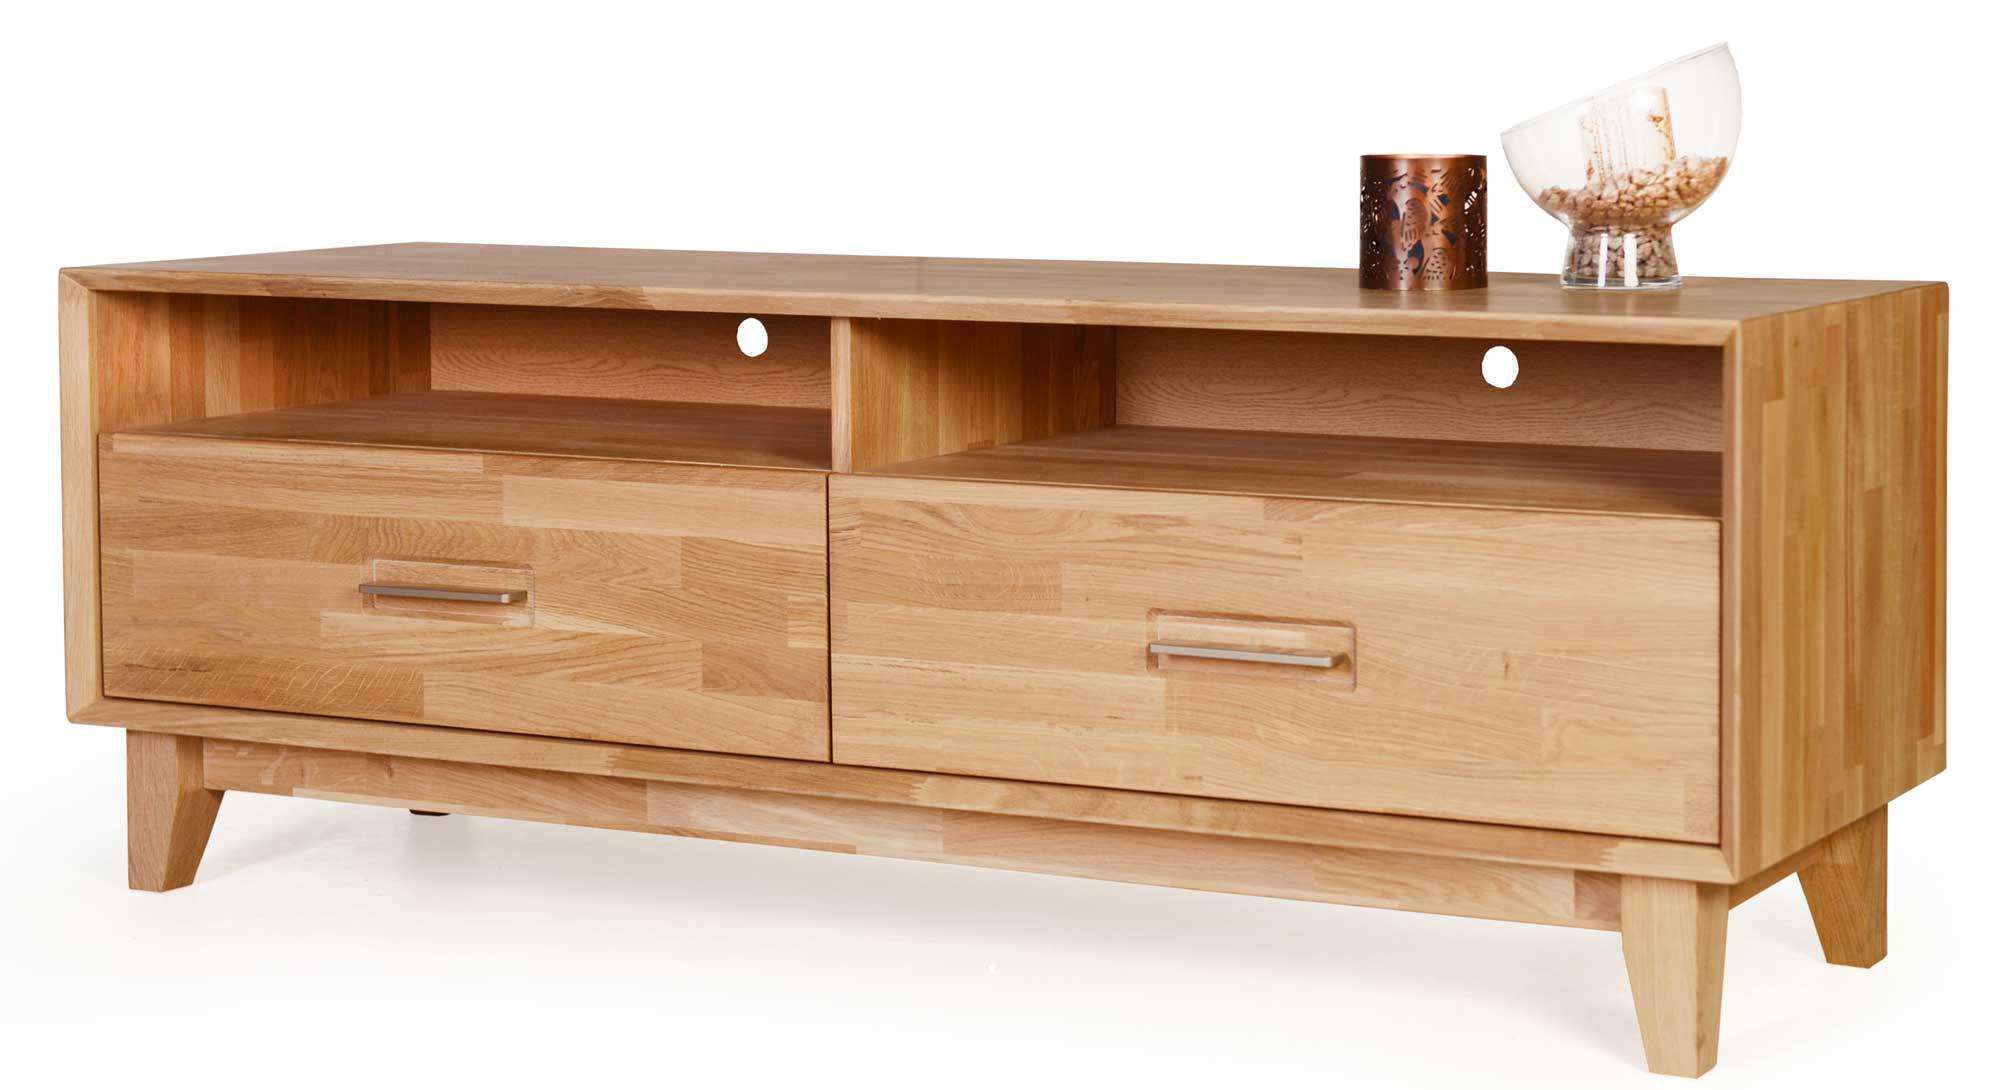 Standard Furniture Numero Uno TV Unterschrank massiv eiche